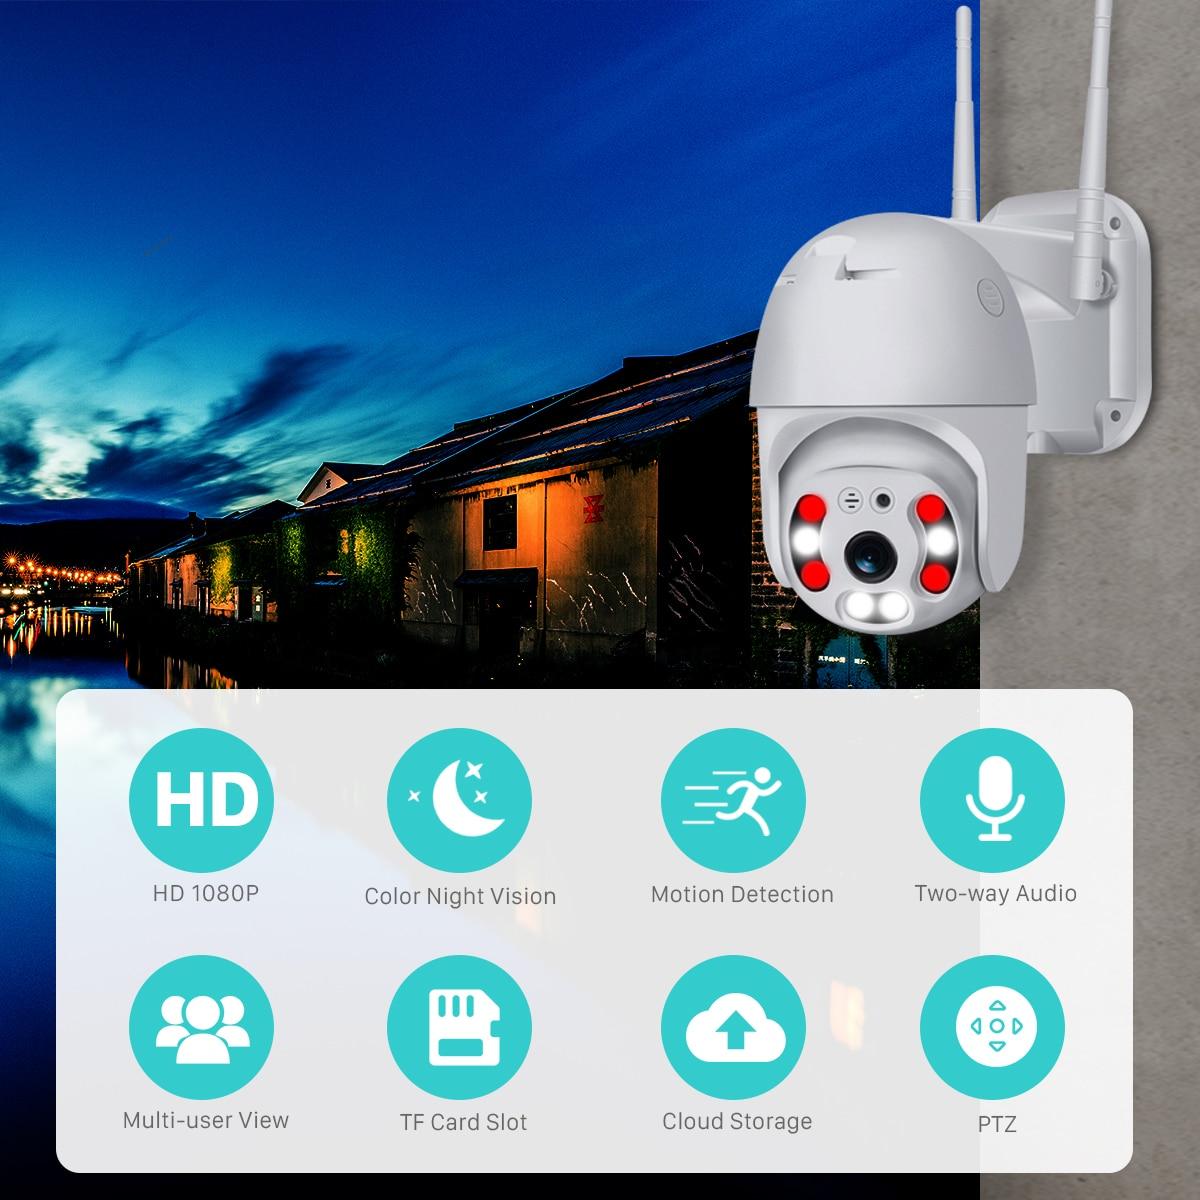 He37ad6e30cb84474a9d0c4c3ff580821g BESDER 1080P Outdoor Speed Dome Wifi Camera 2MP H.265 Audio PTZ Wireless Camera Cloud-SD Slot ONVIF Home Surveillance IP Camera